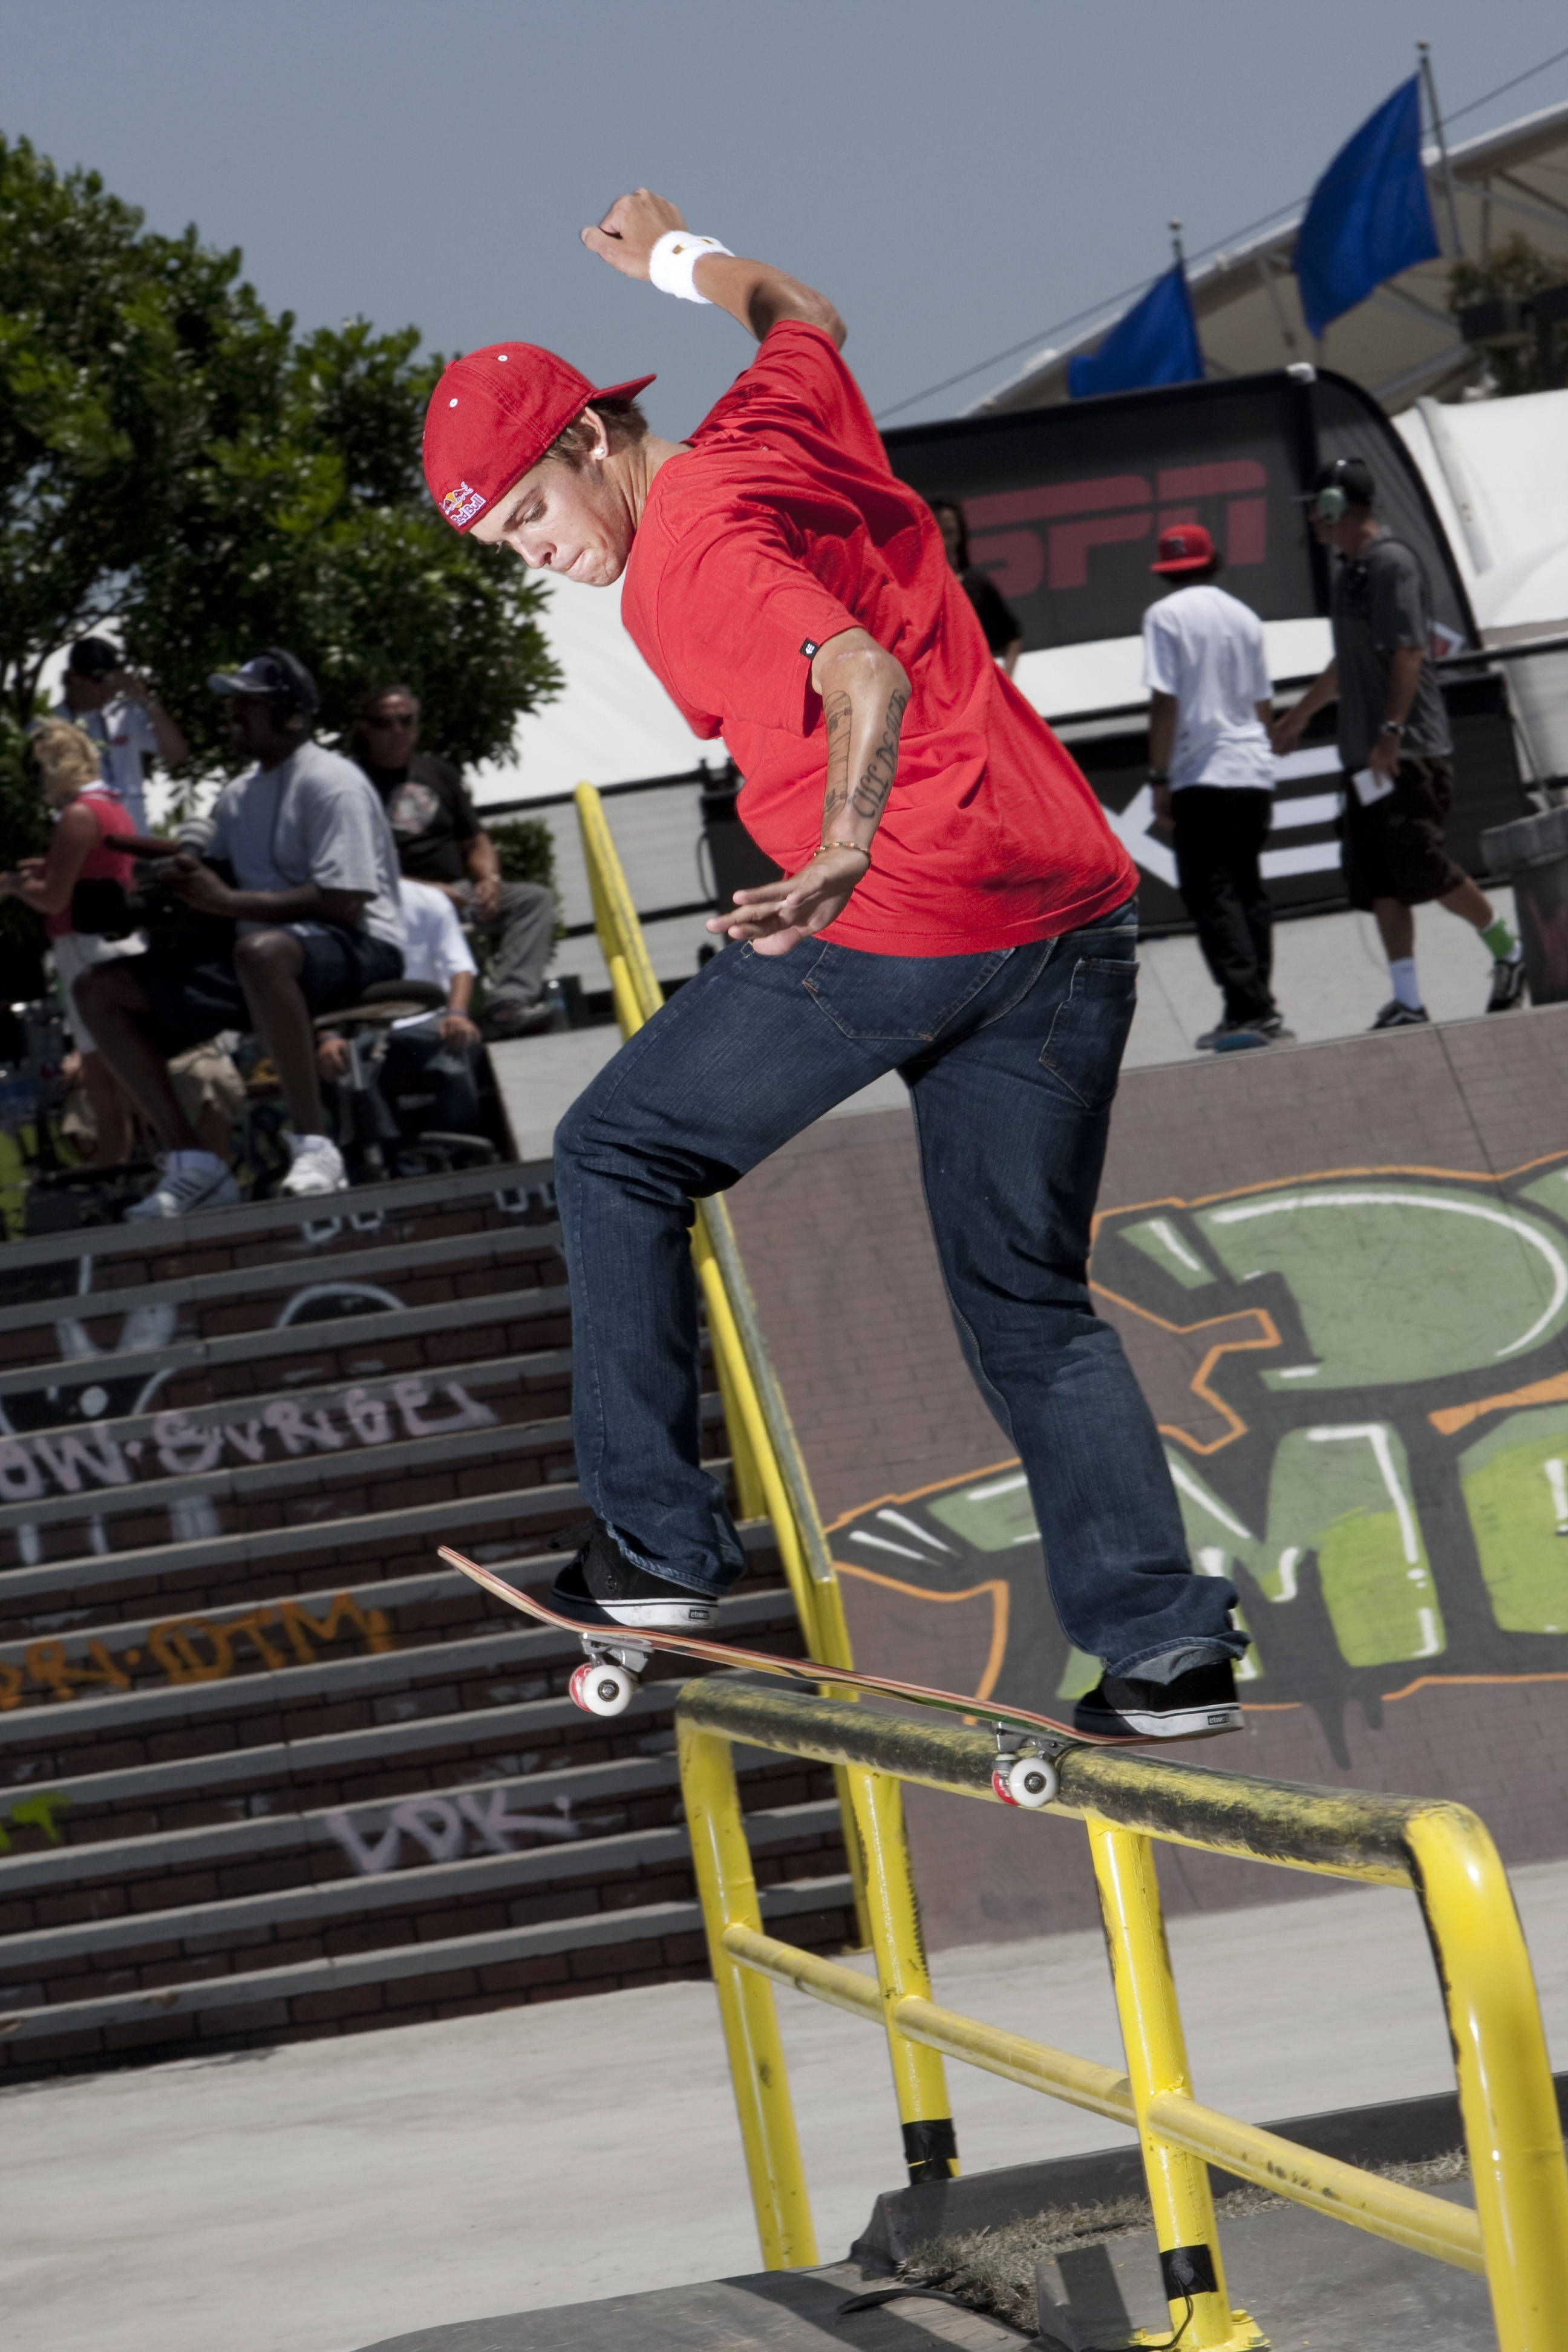 Ryan Sheckler: Pro Skater Plan B | Skate your ways ...